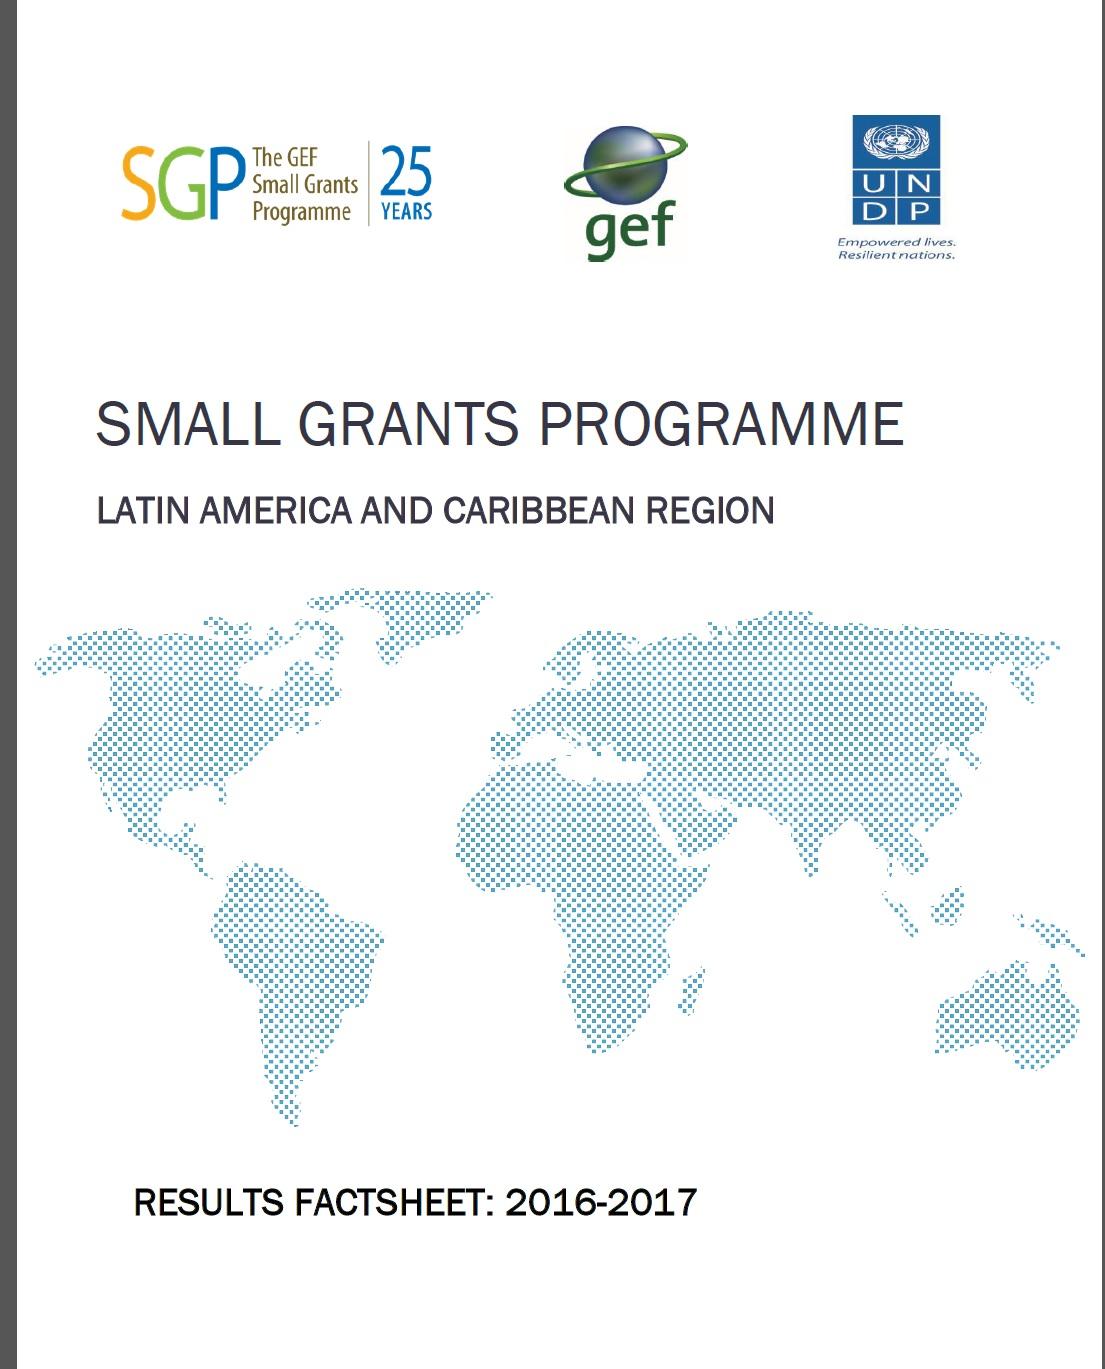 SGP LAC: Results fact sheet 2016 - 2017